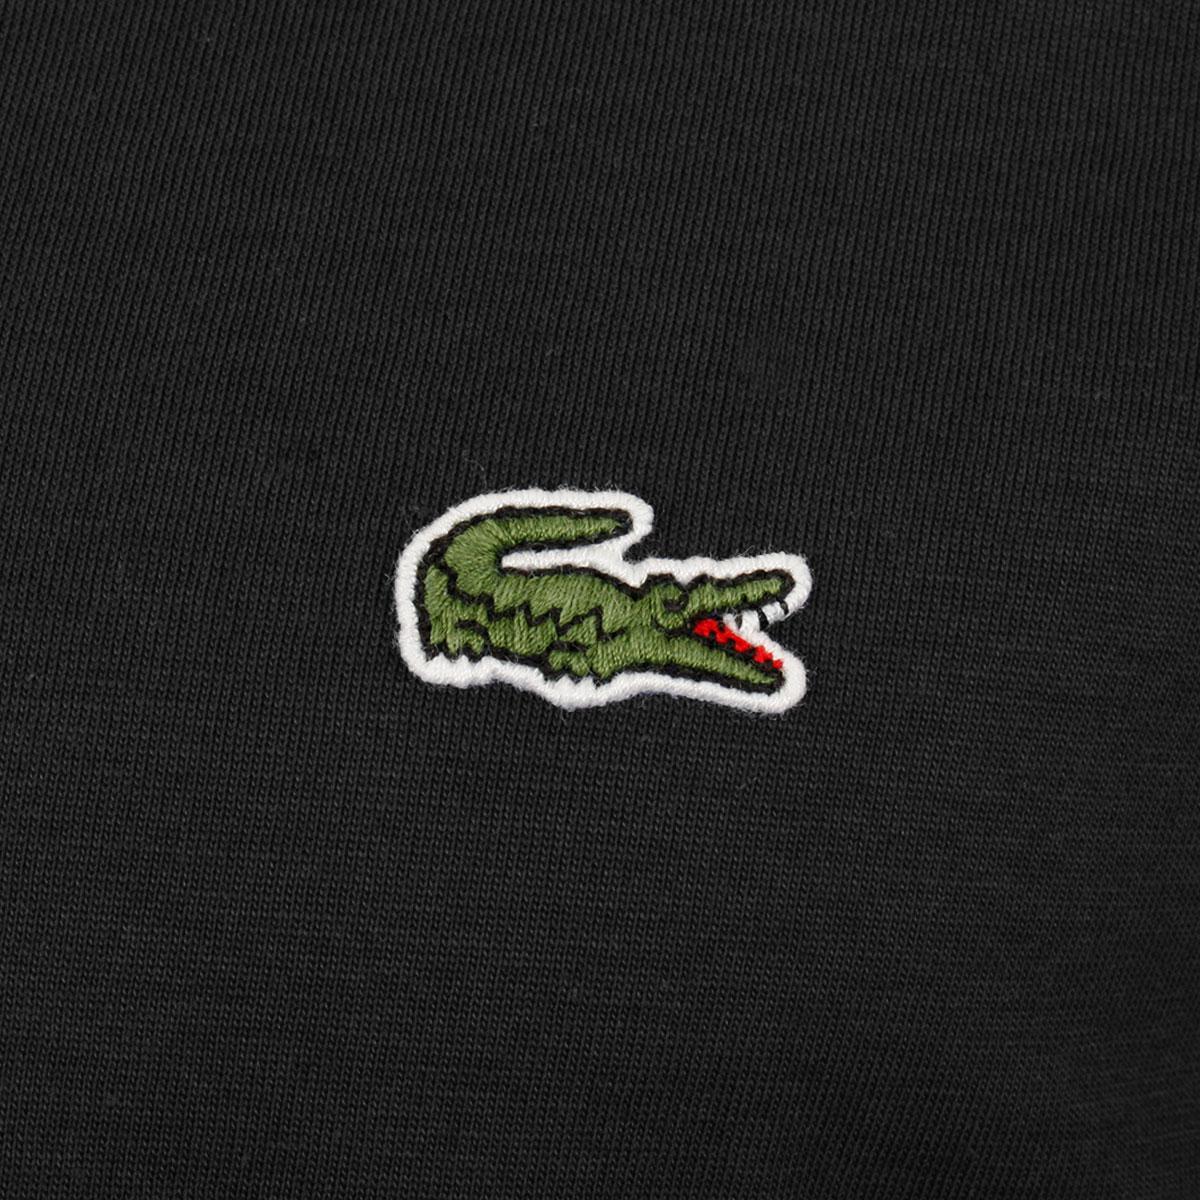 Lacoste-Mens-2019-SS-V-Neck-TH6710-Short-Sleeve-Pima-Cotton-Tee-T-Shirt thumbnail 6